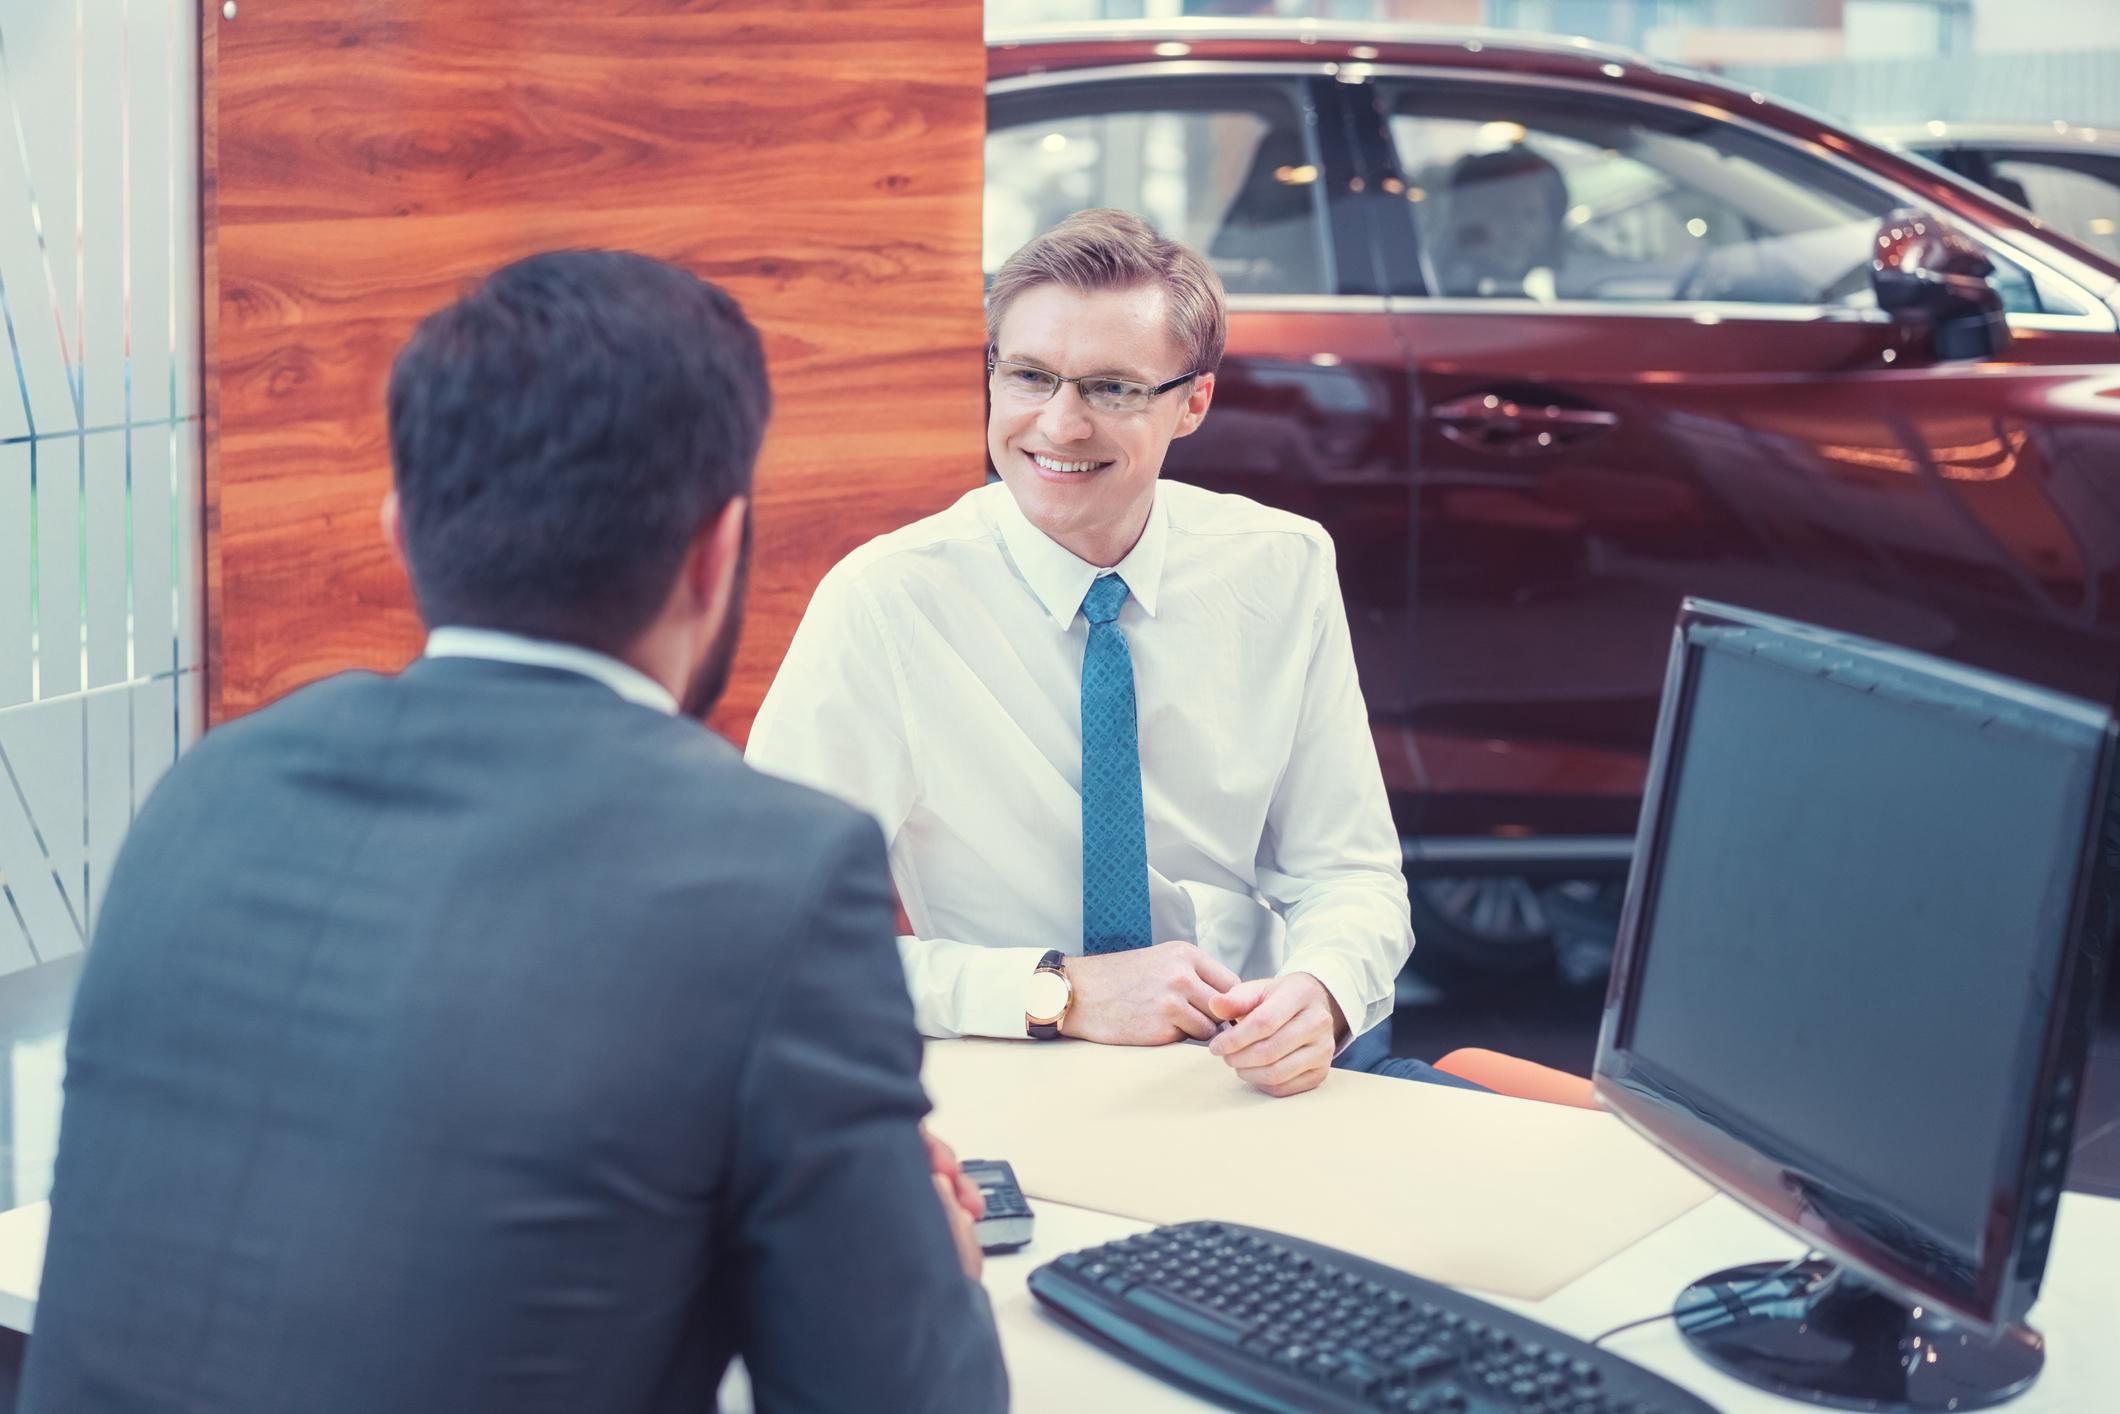 Conversation at Car Dealership